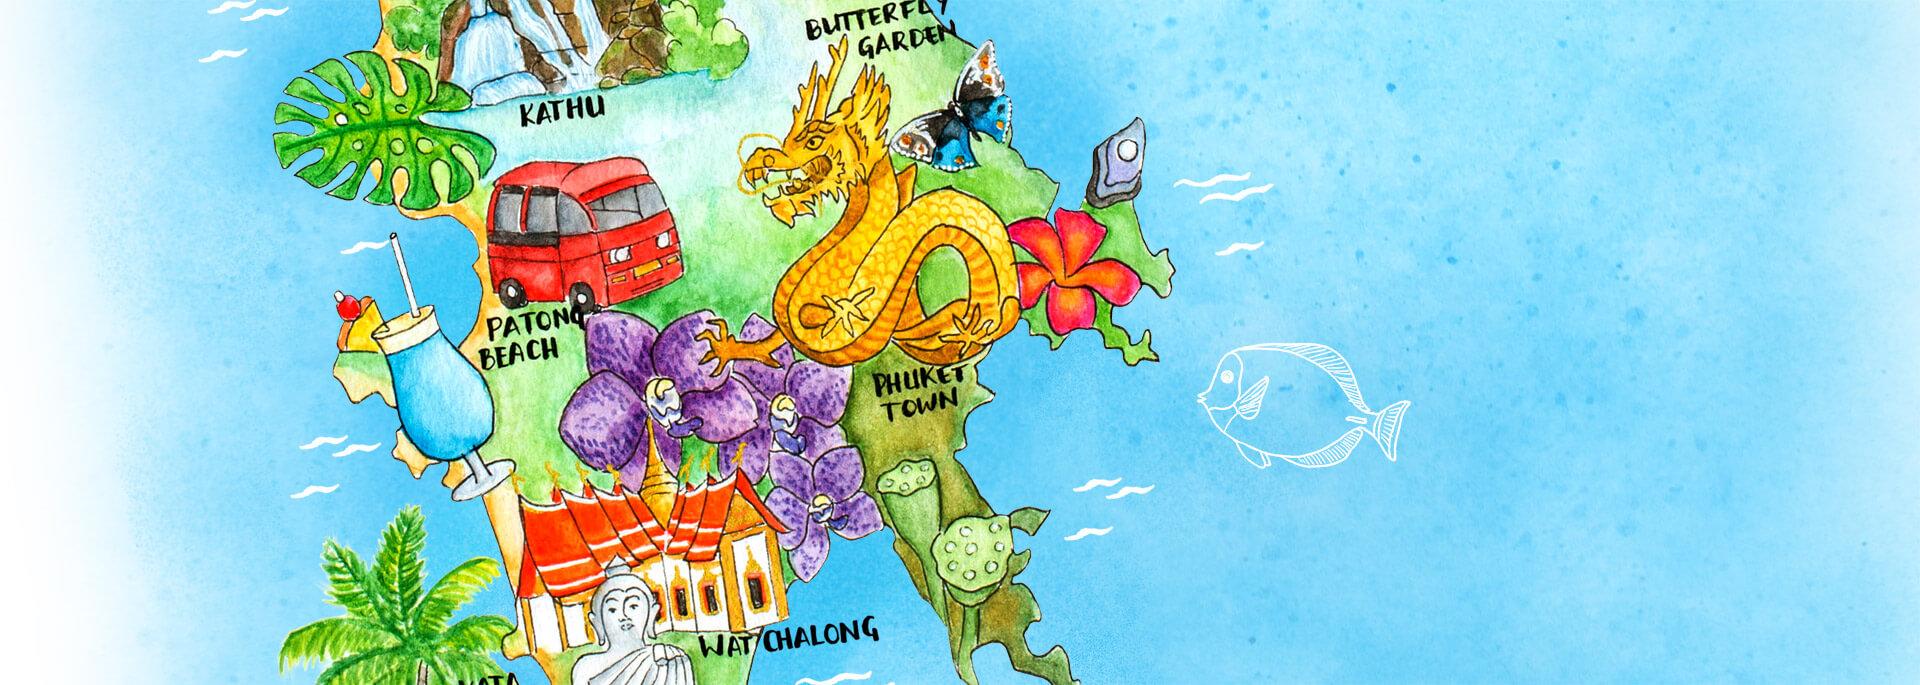 Kalender Illustrierte Inseln 2017 – Juni: Phuket